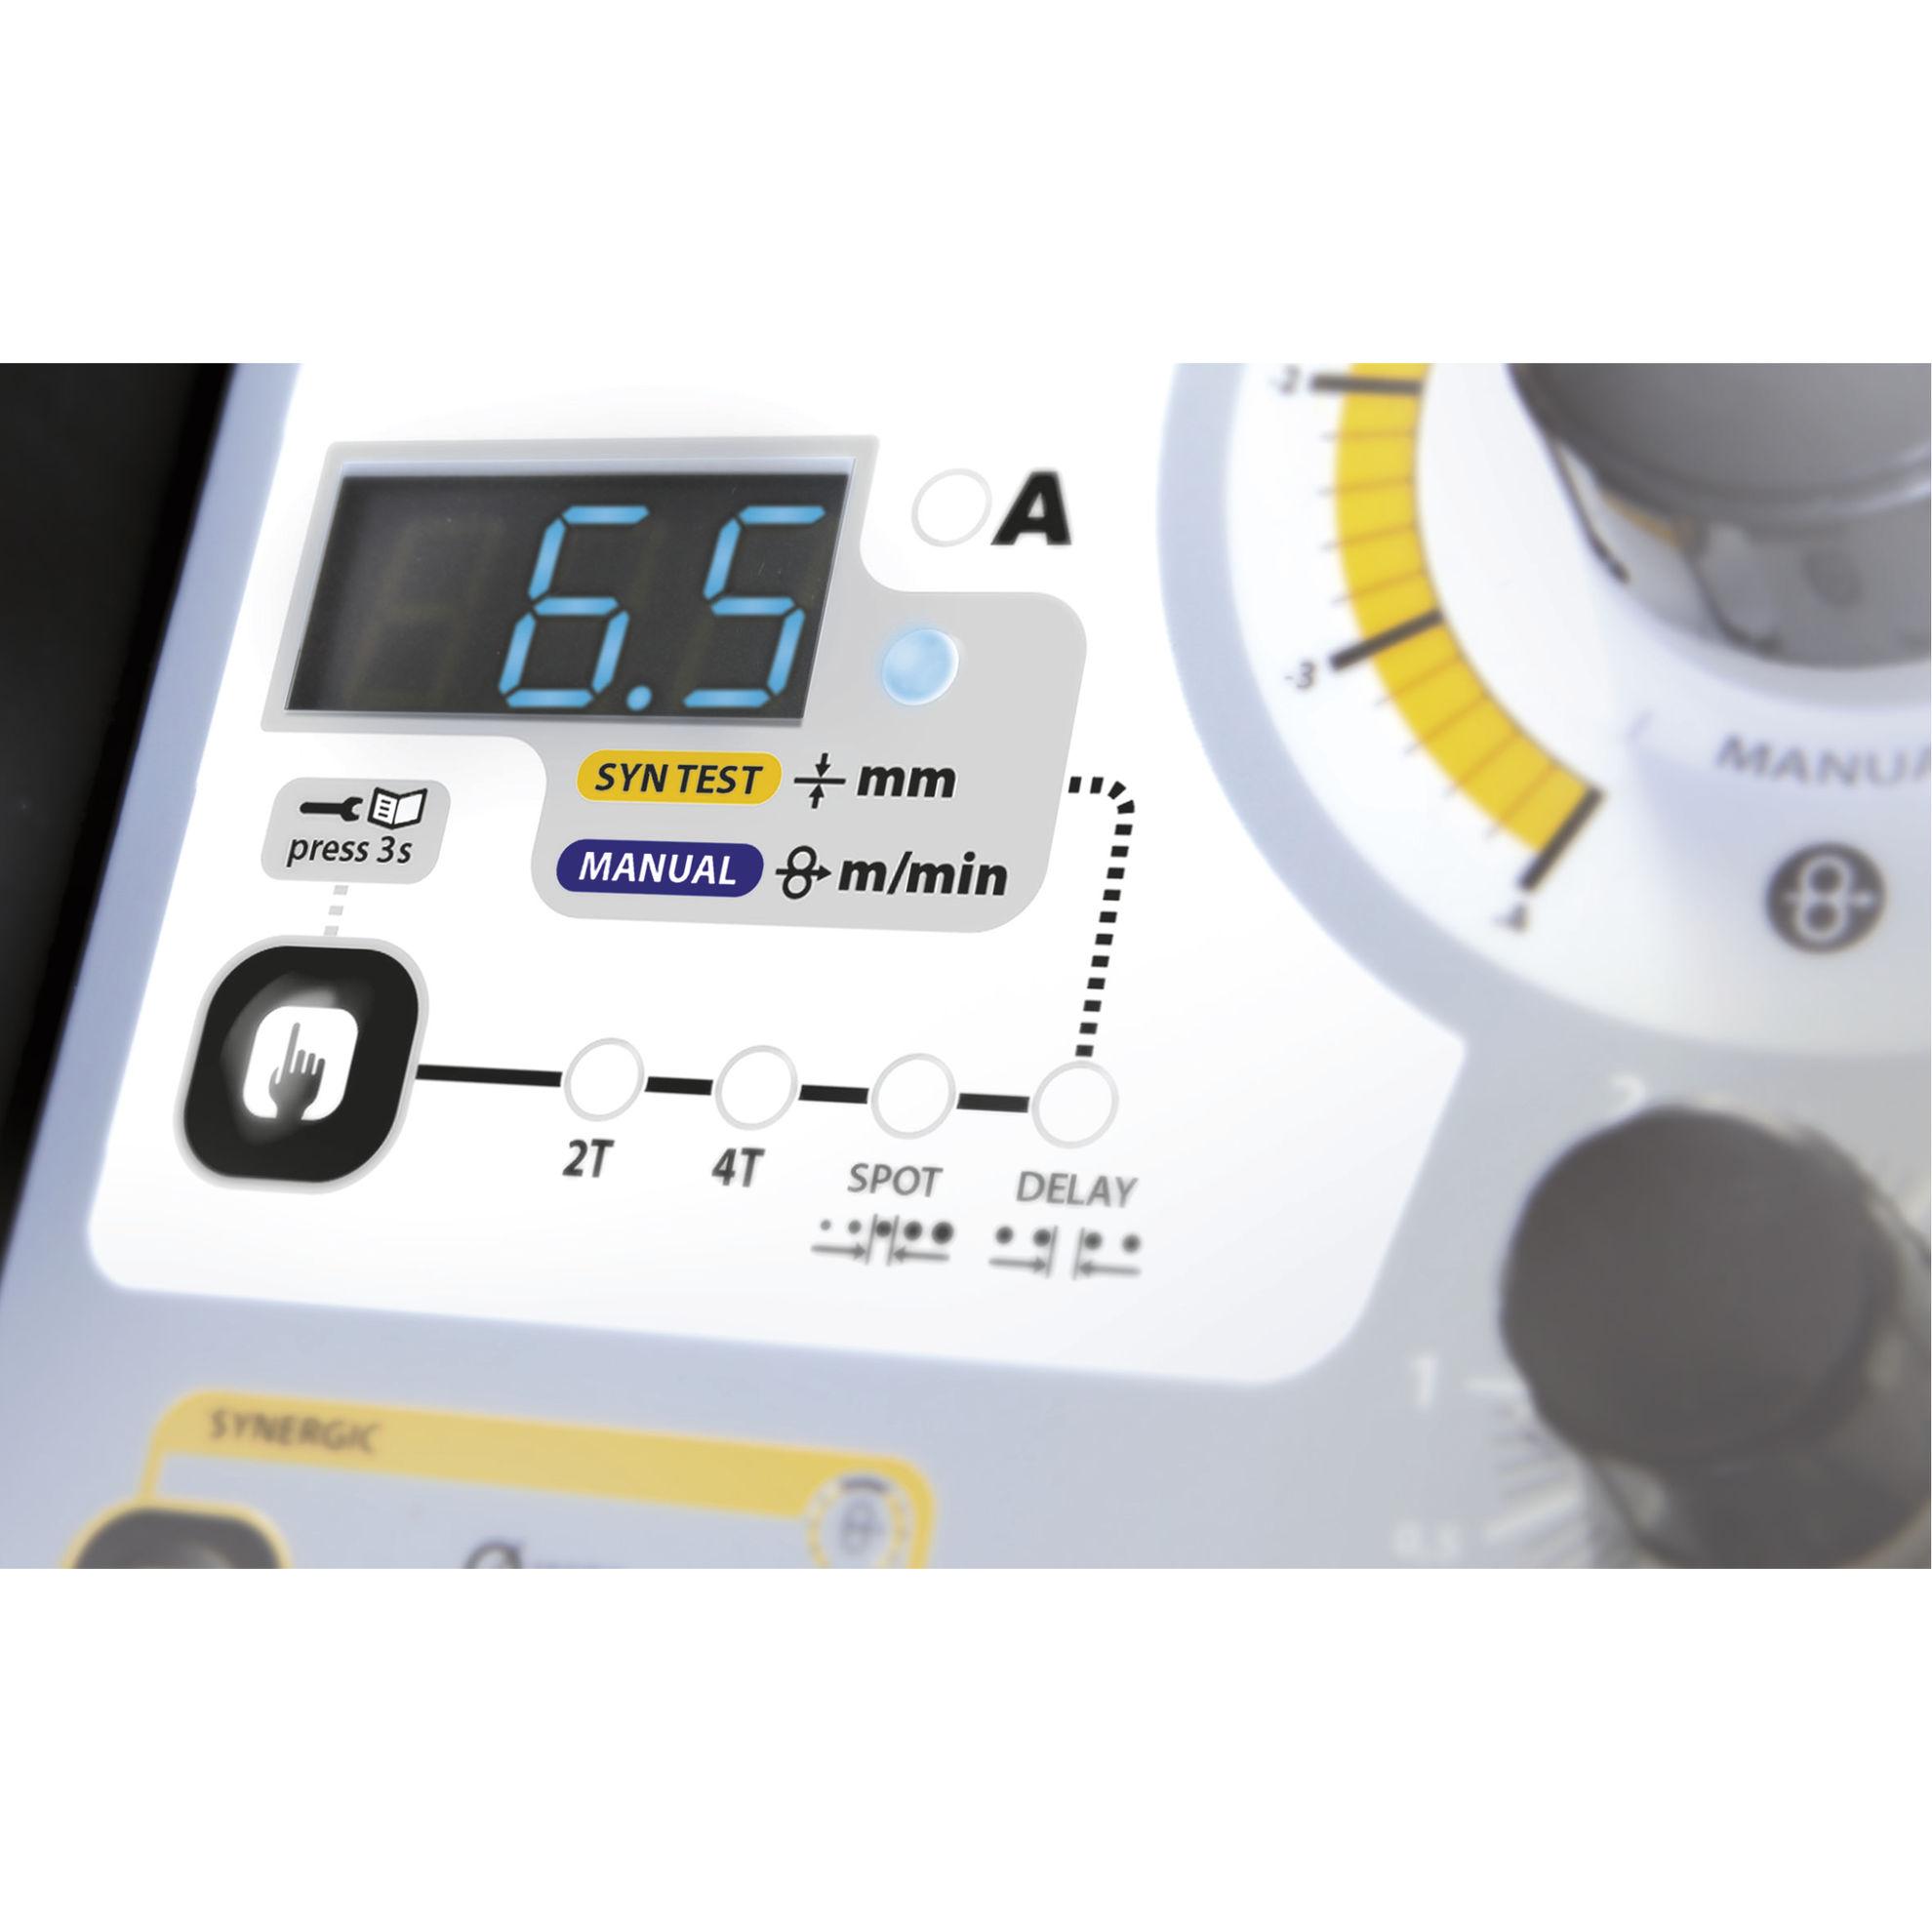 Slika Varilni aparat GYS, MAGYS 400 GR, brez opreme